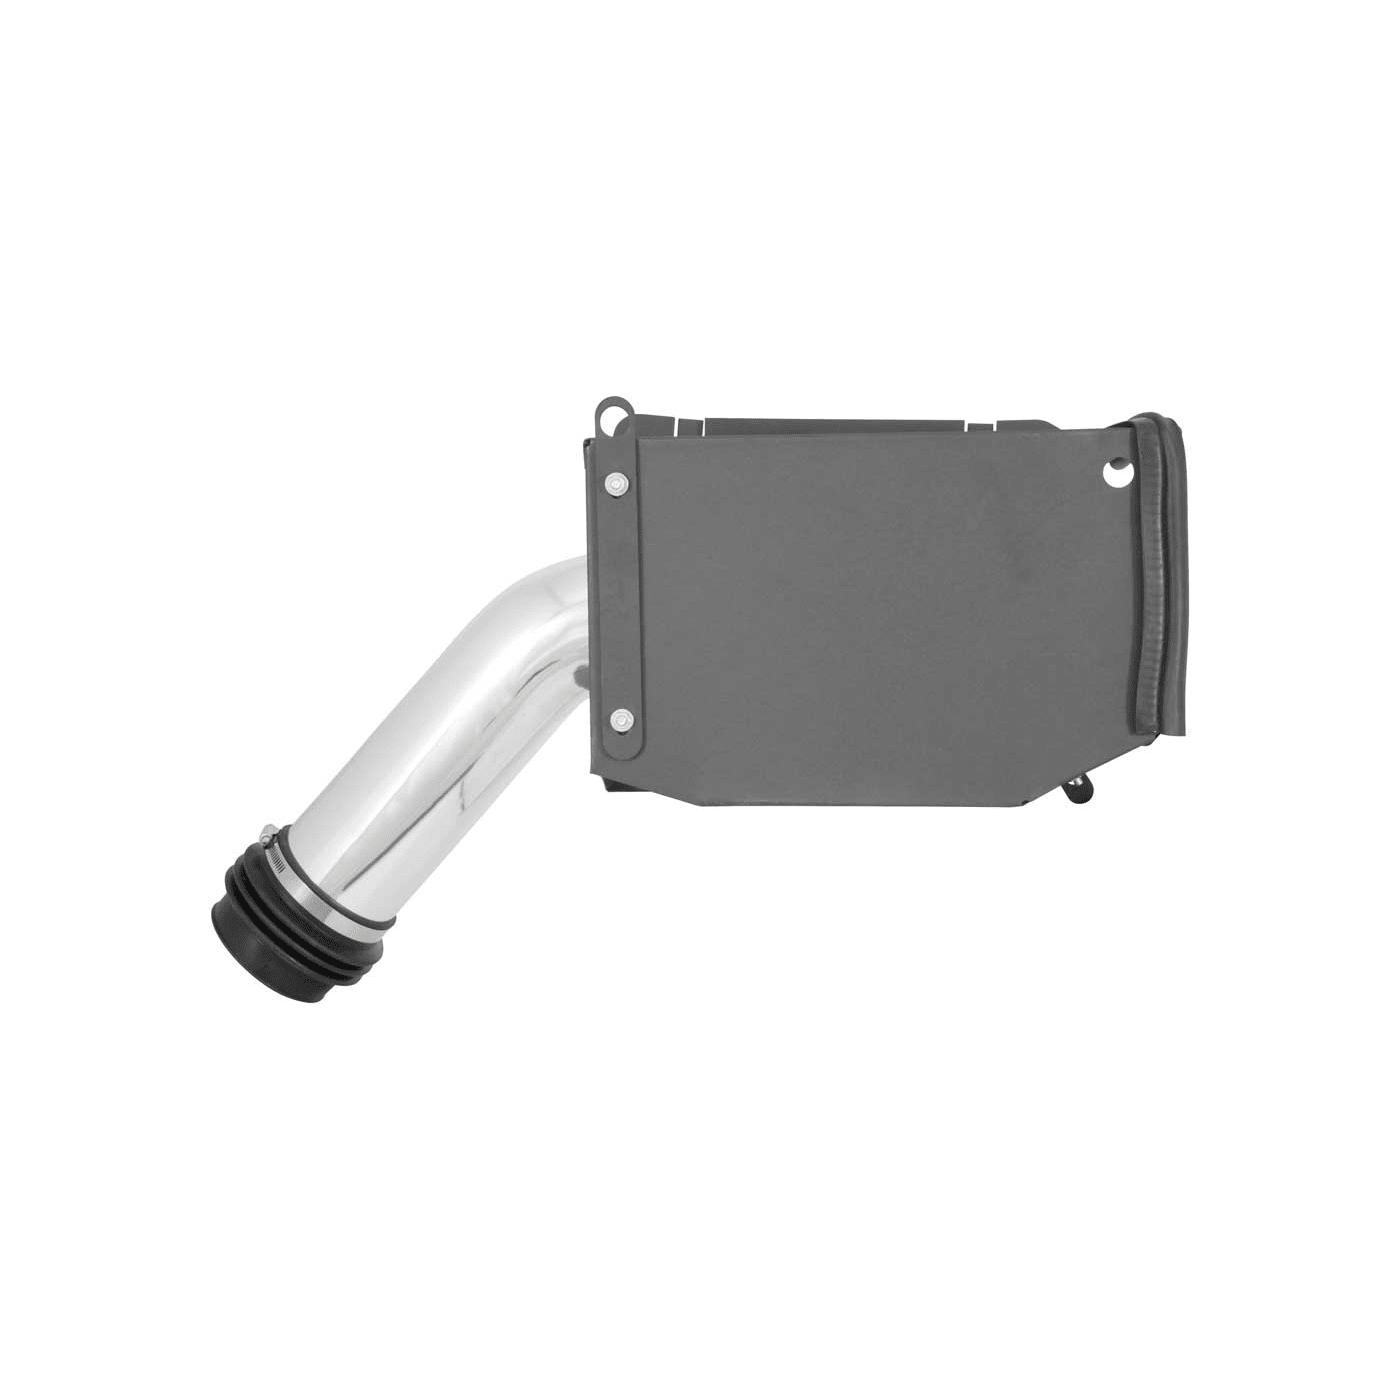 SPE 9059 Spectre Performance 9059 Air Intake Kit